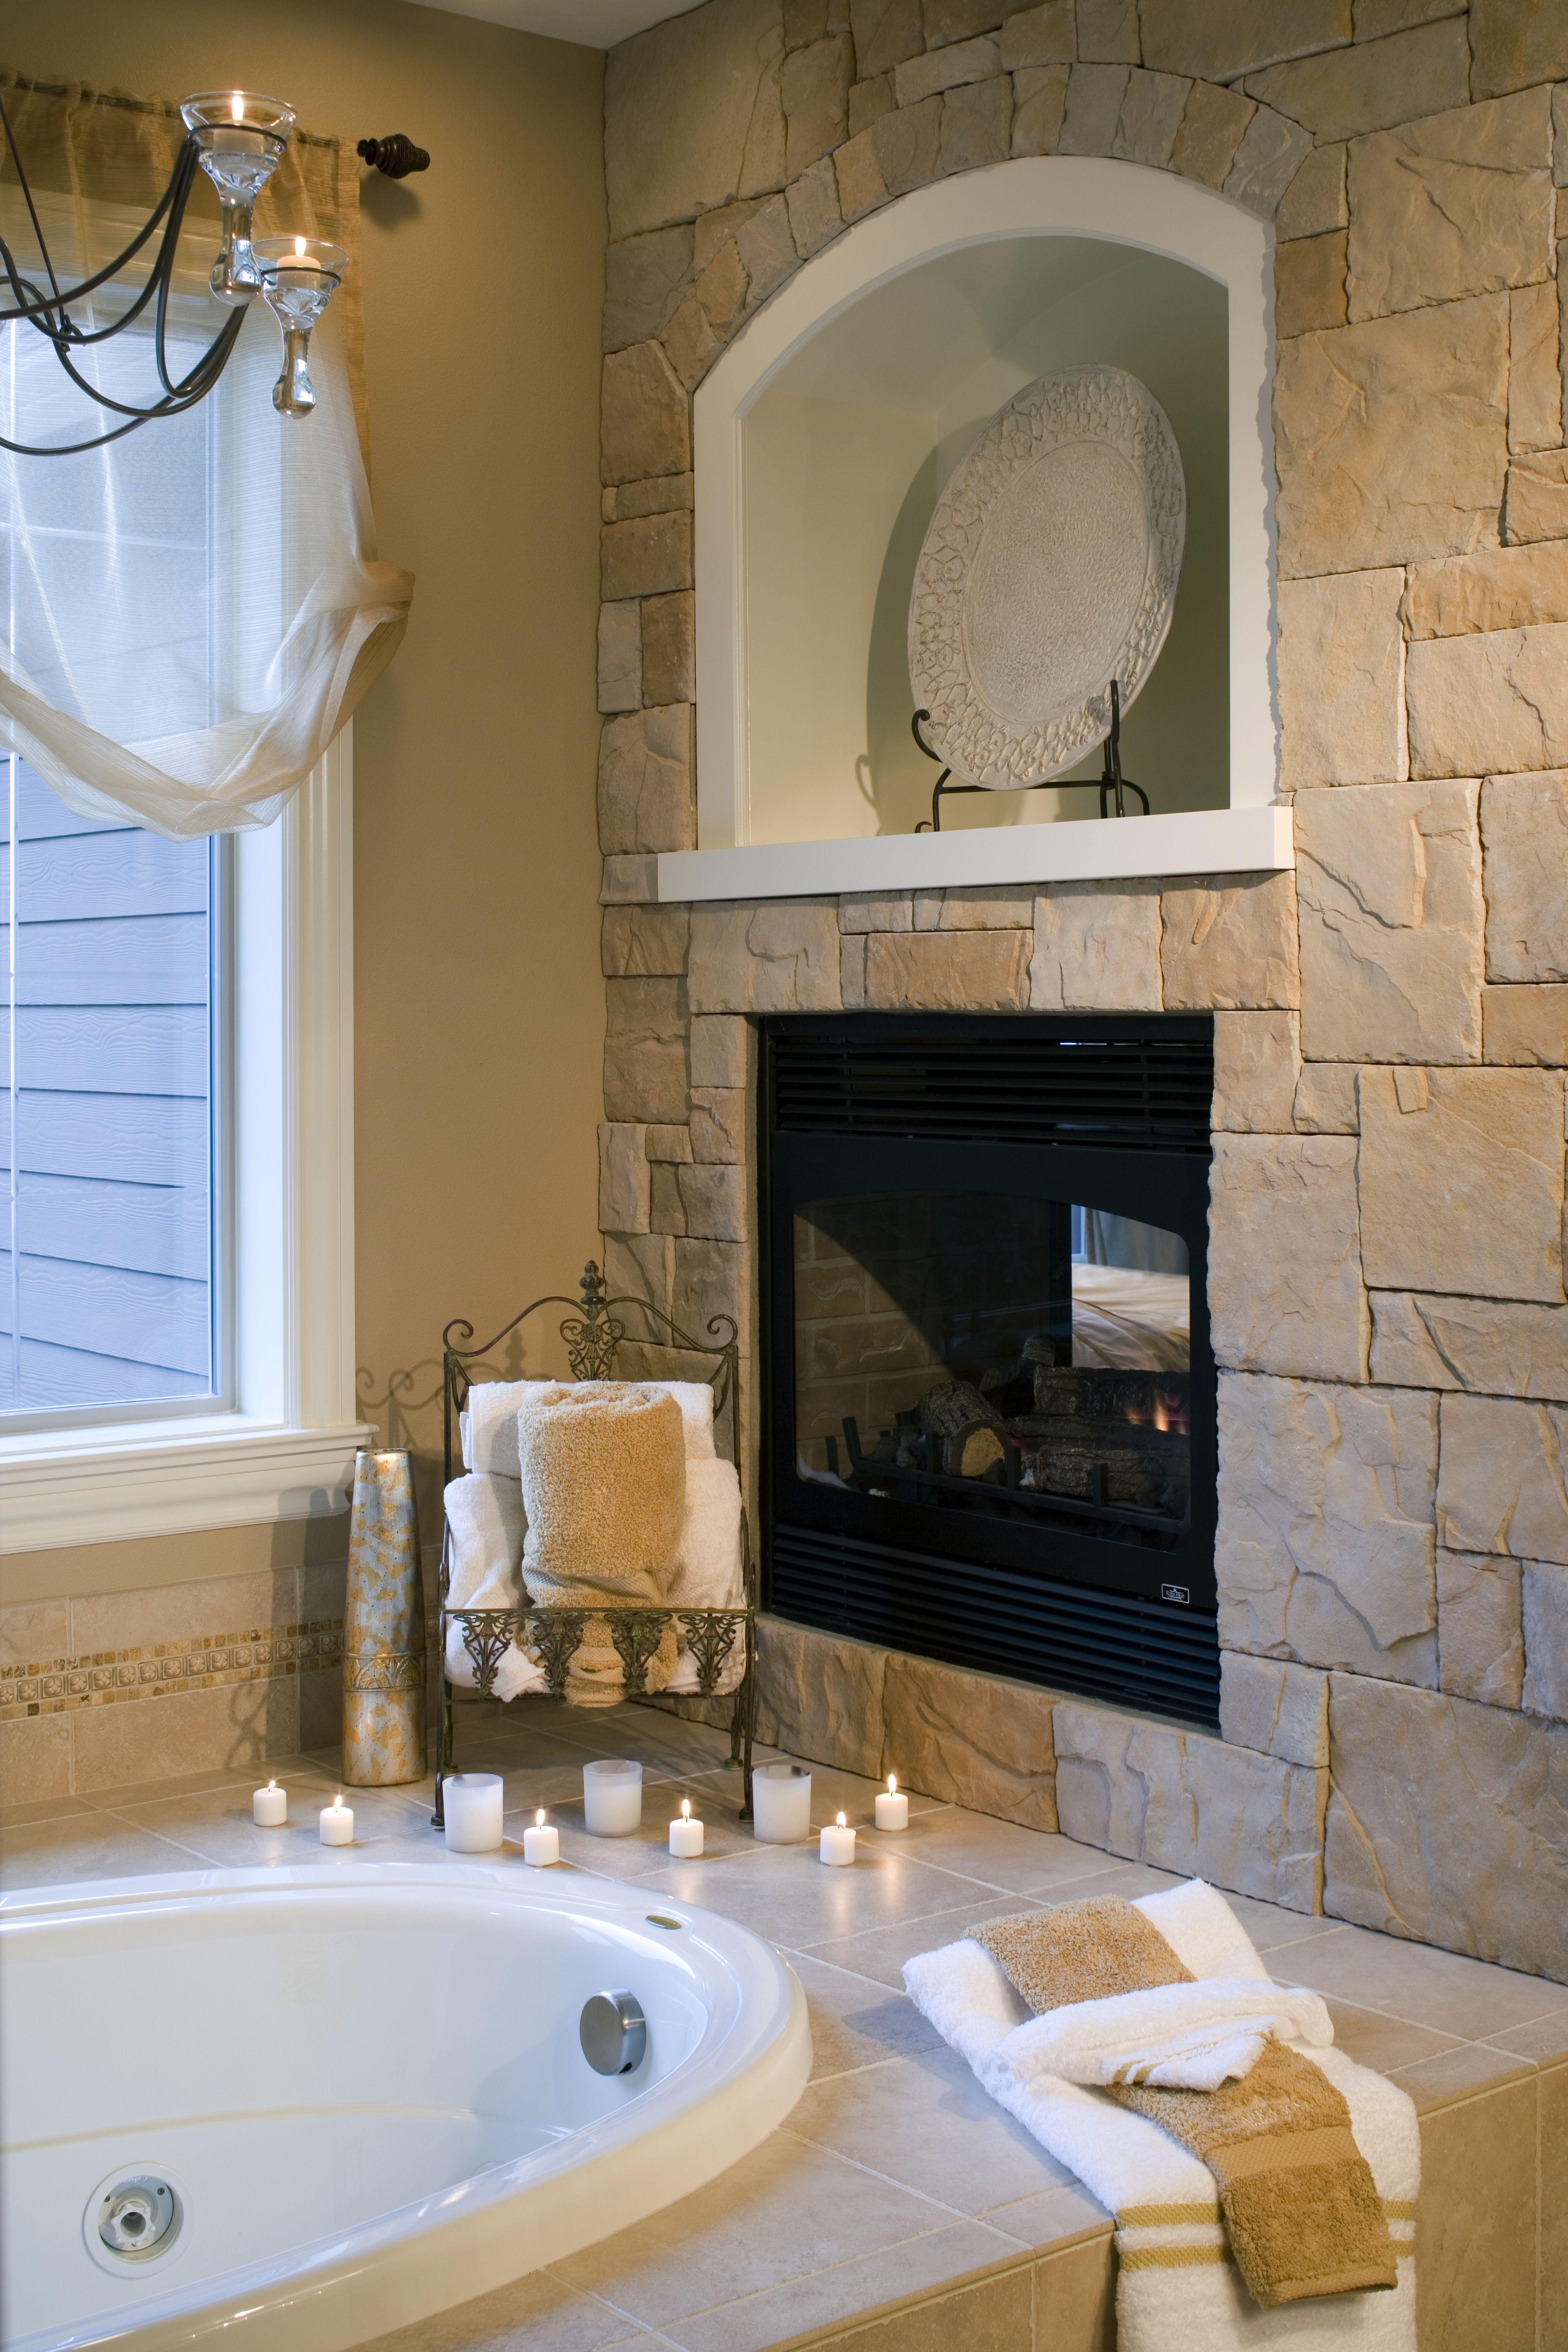 Luxury master bathroom remodeling ideas window valences luxurious bathrooms and jacuzzi tub for Master bathroom with jacuzzi tub